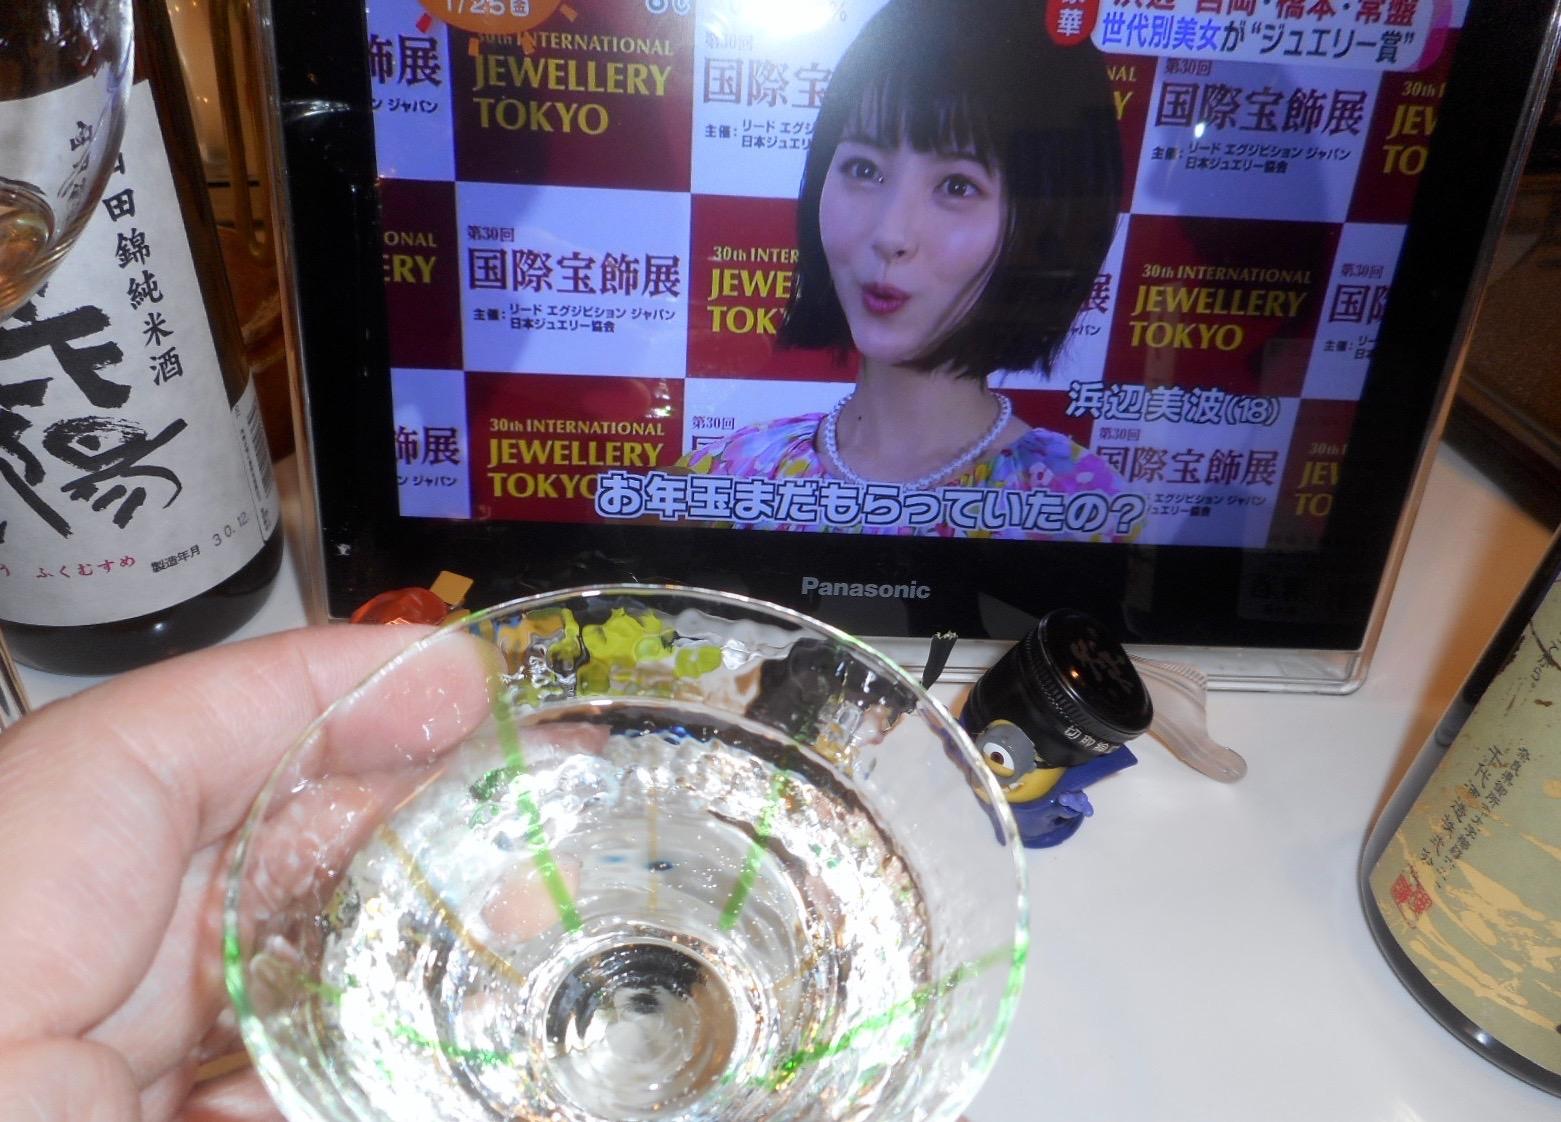 kujira2015_3_3.jpg